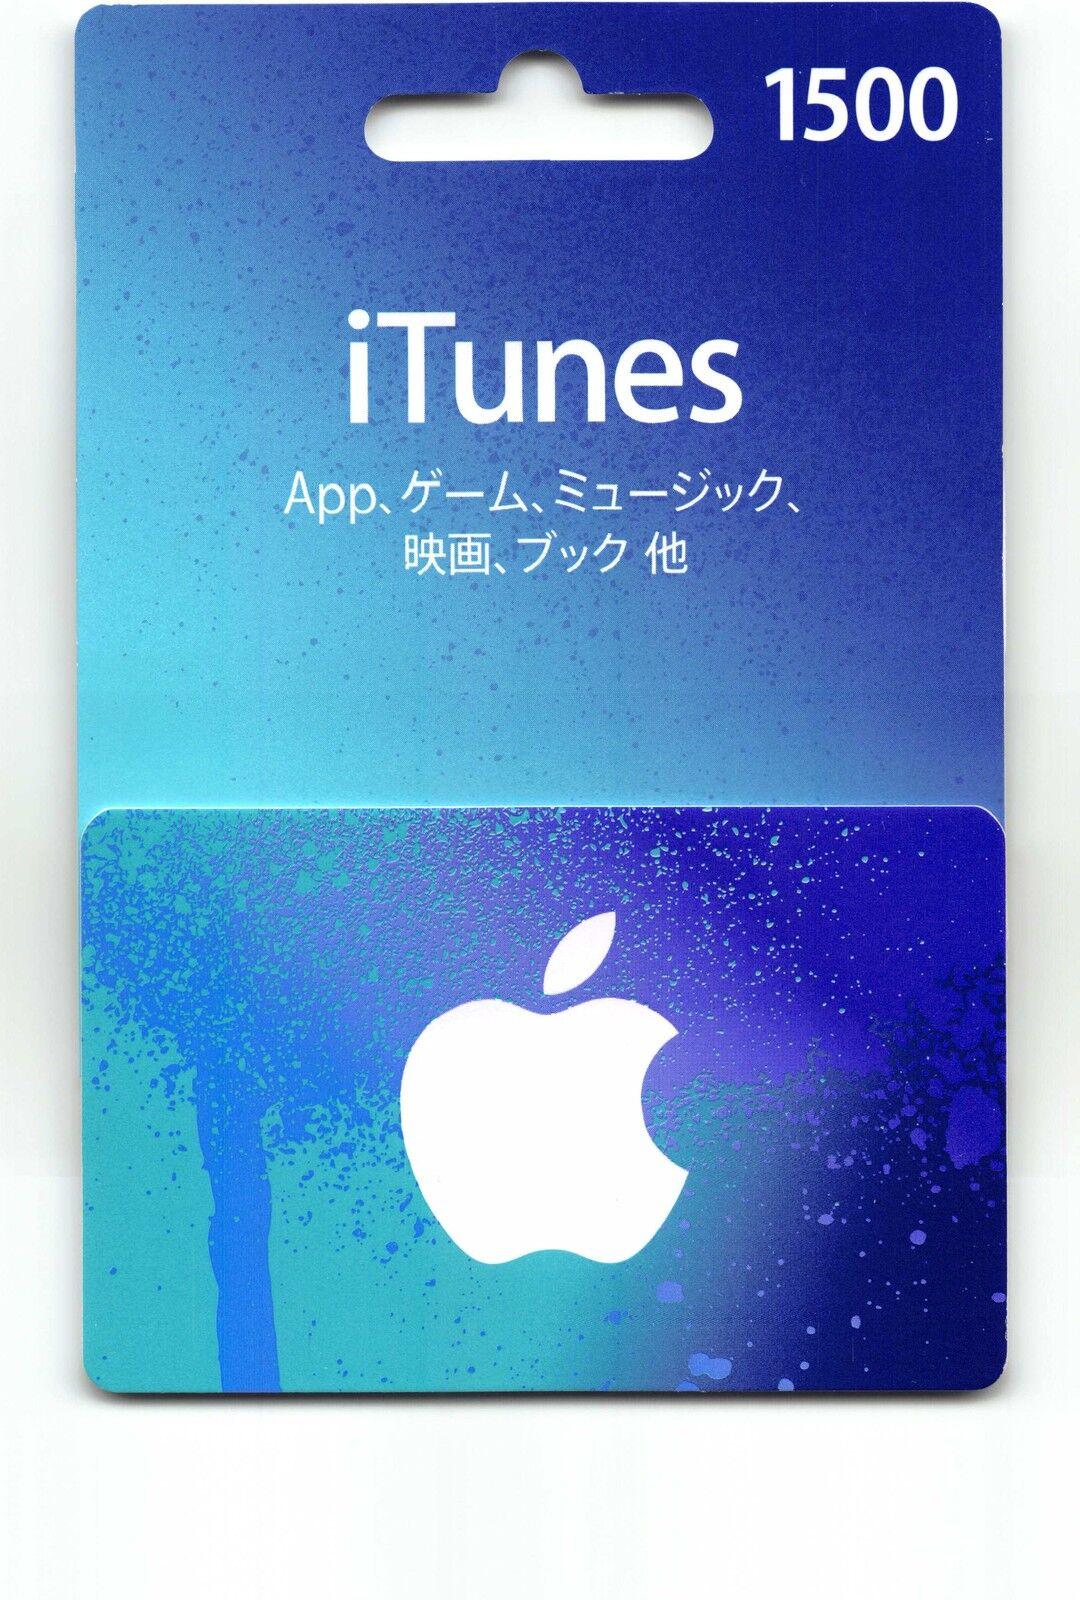 iTunes Gift Card 1500 ¥ Yen JAPAN Apple App Store Key Code JAPANESE | iPhone..